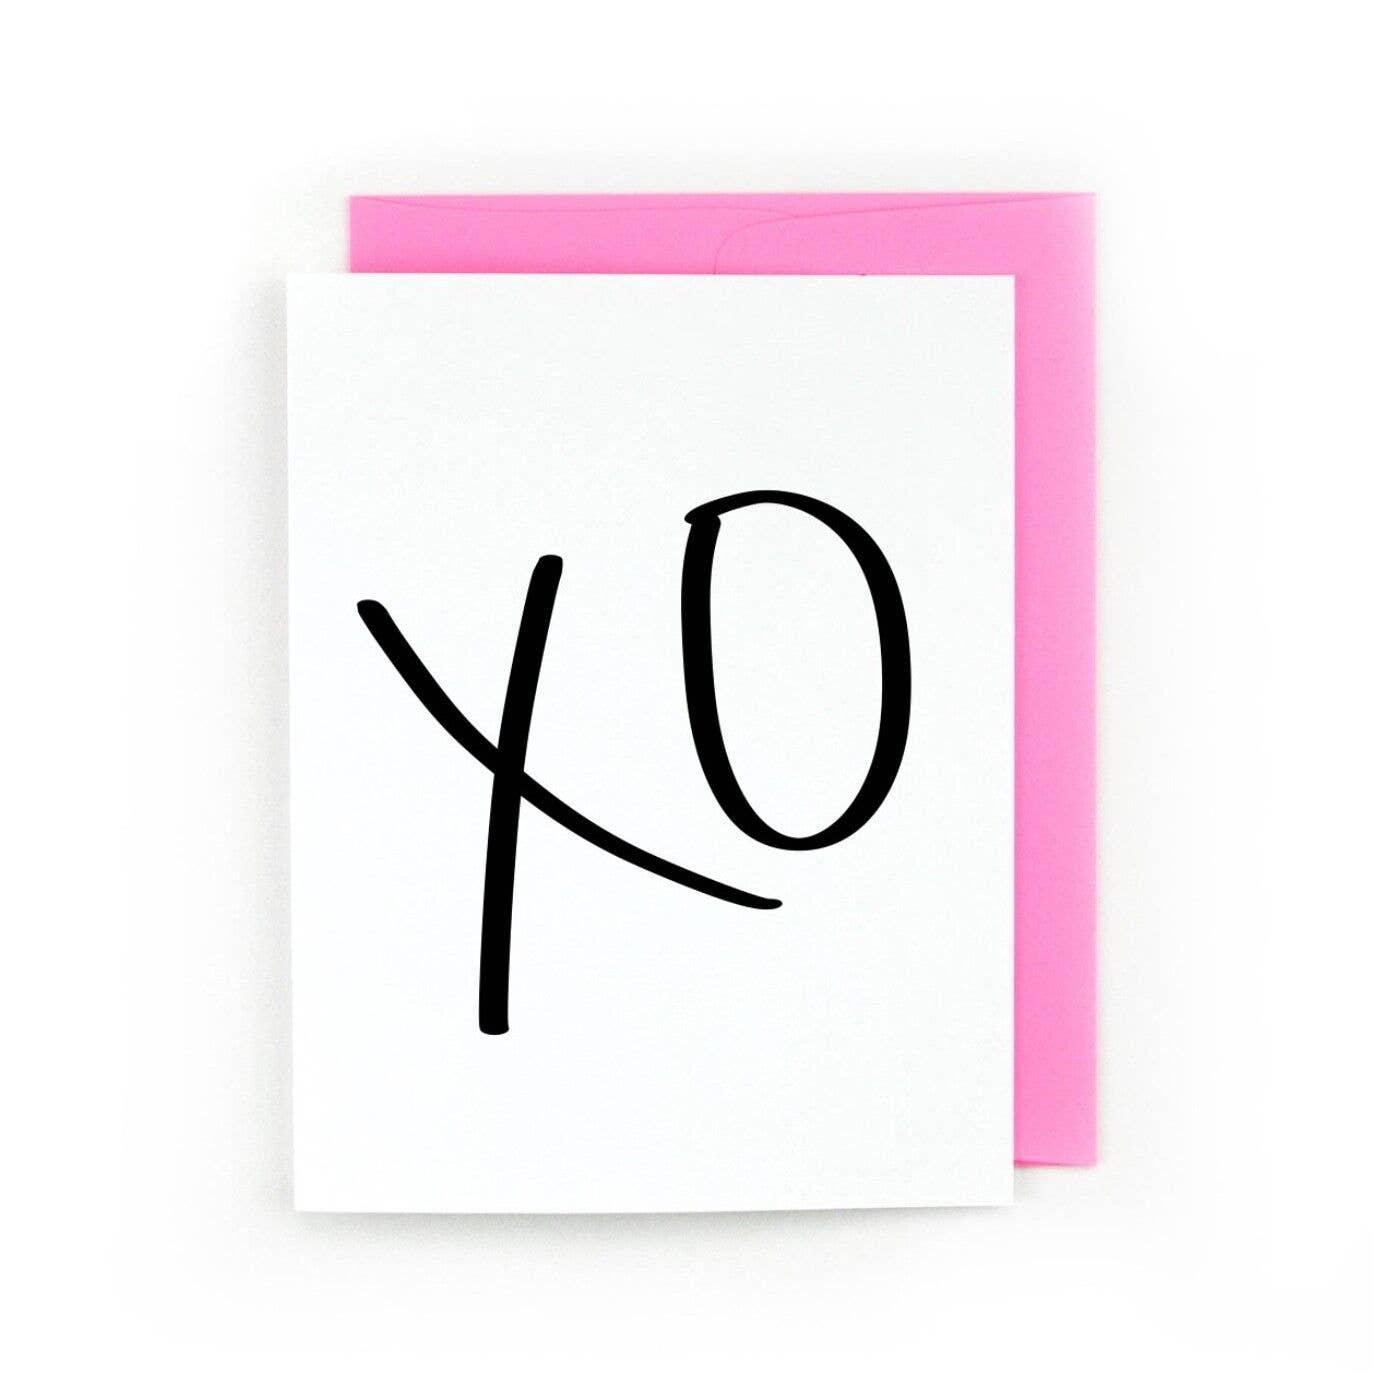 XO Minimal | Trada Marketplace